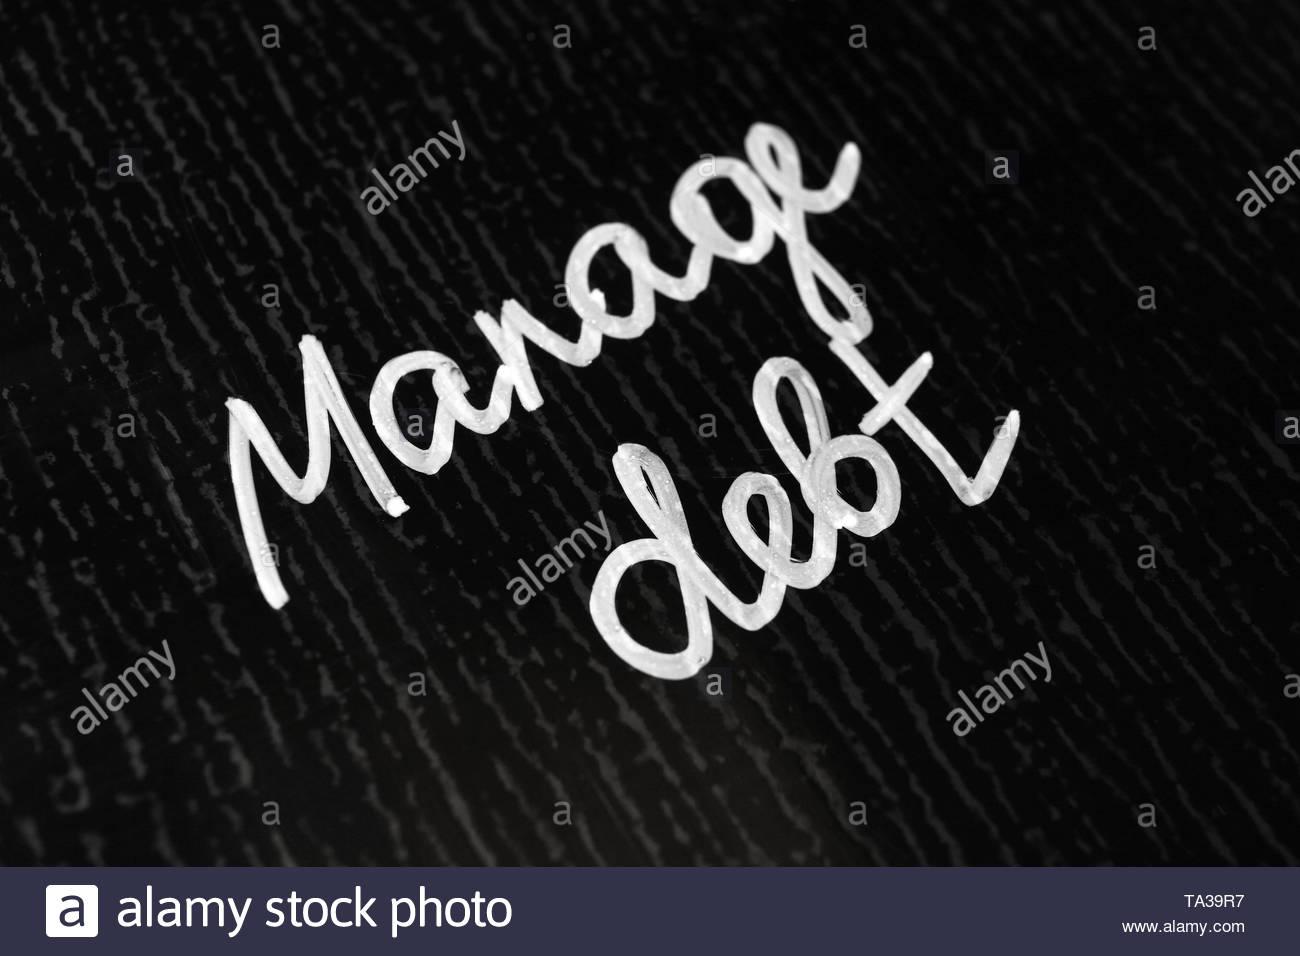 Text MANAGE DEBT on dark background Stock Photo 247165275   Alamy 1300x956